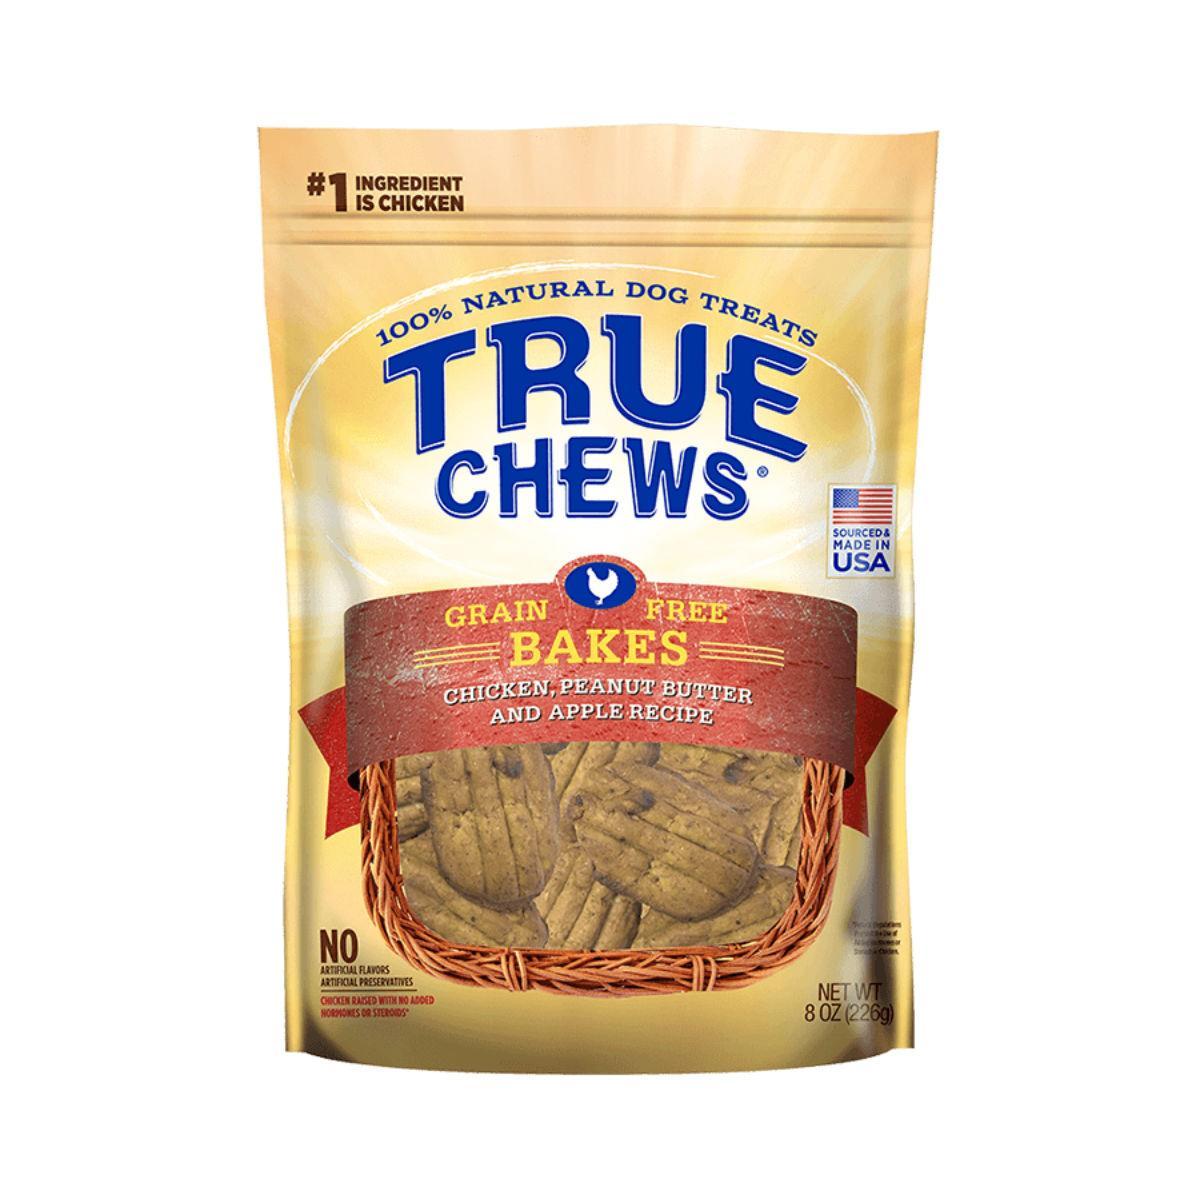 True Chews Grain Free Bakes Dog Treat - Chicken, Peanut Butter & Apple